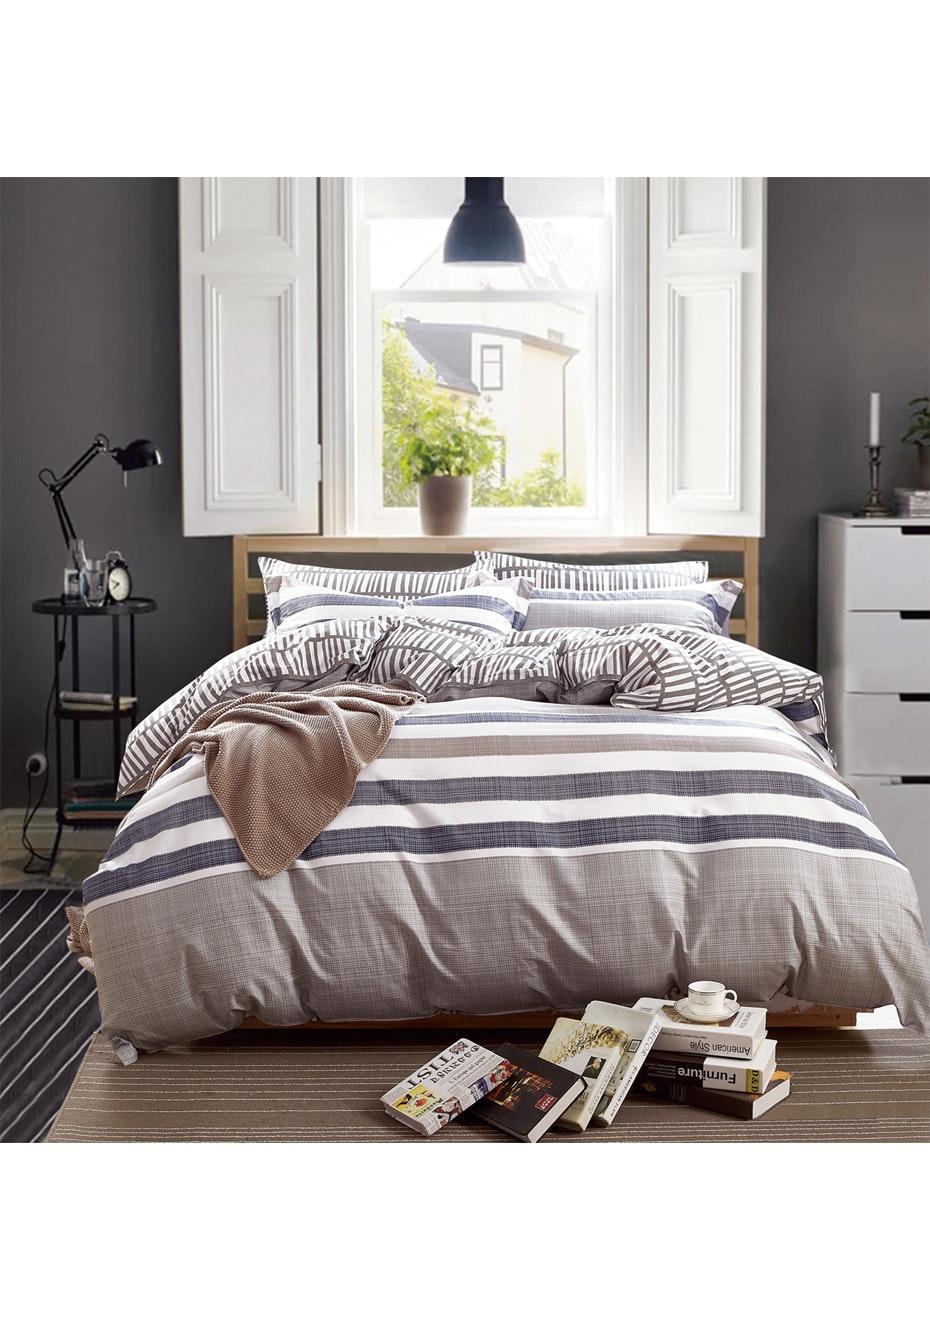 Ballina Quilt Cover Set - Reversible Design - 100% Cotton - Queen Bed